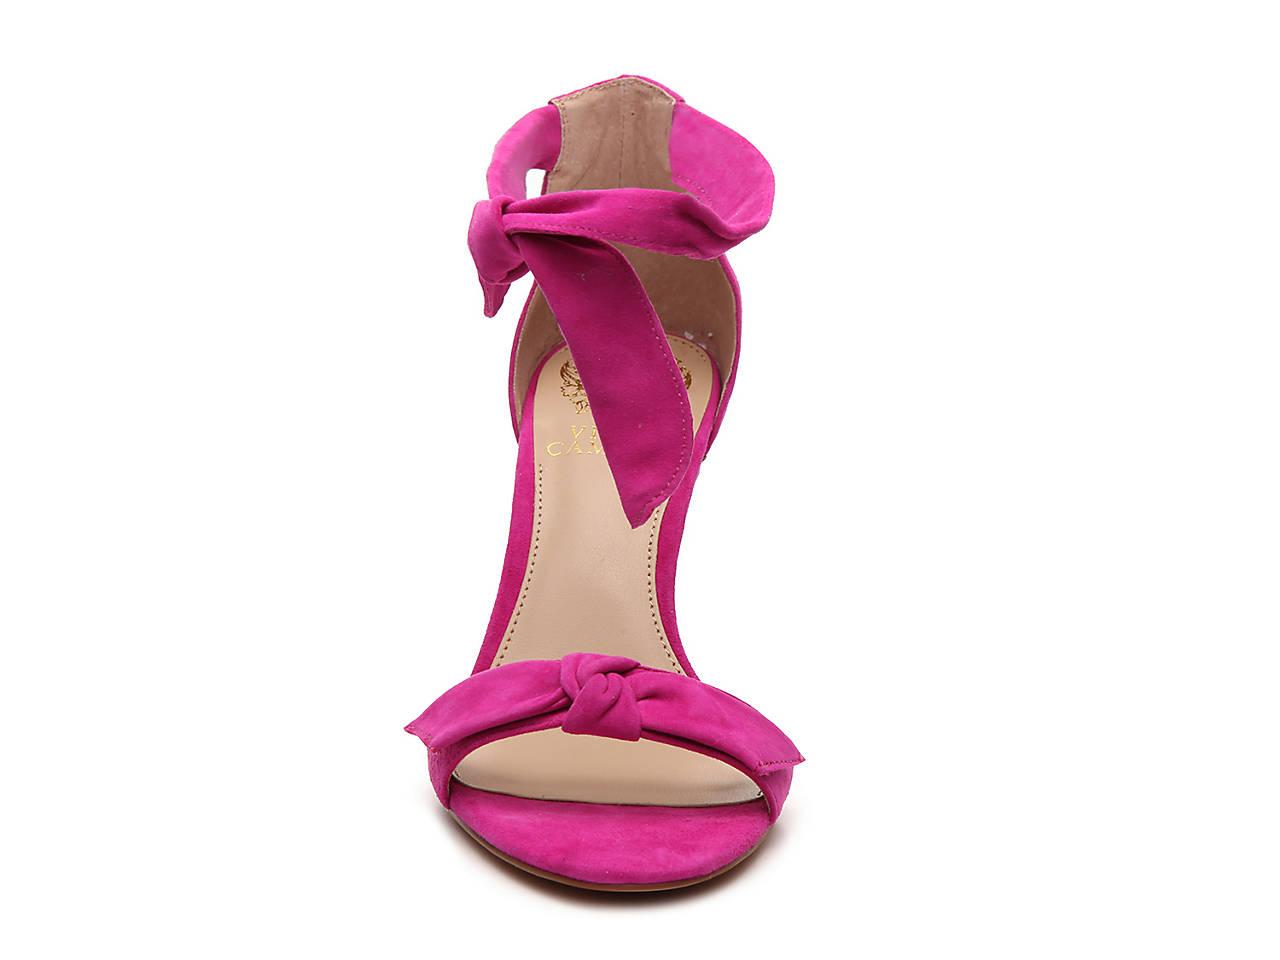 fb8ddb3d3b5 Vince Camuto Camylla Sandal Women s Shoes